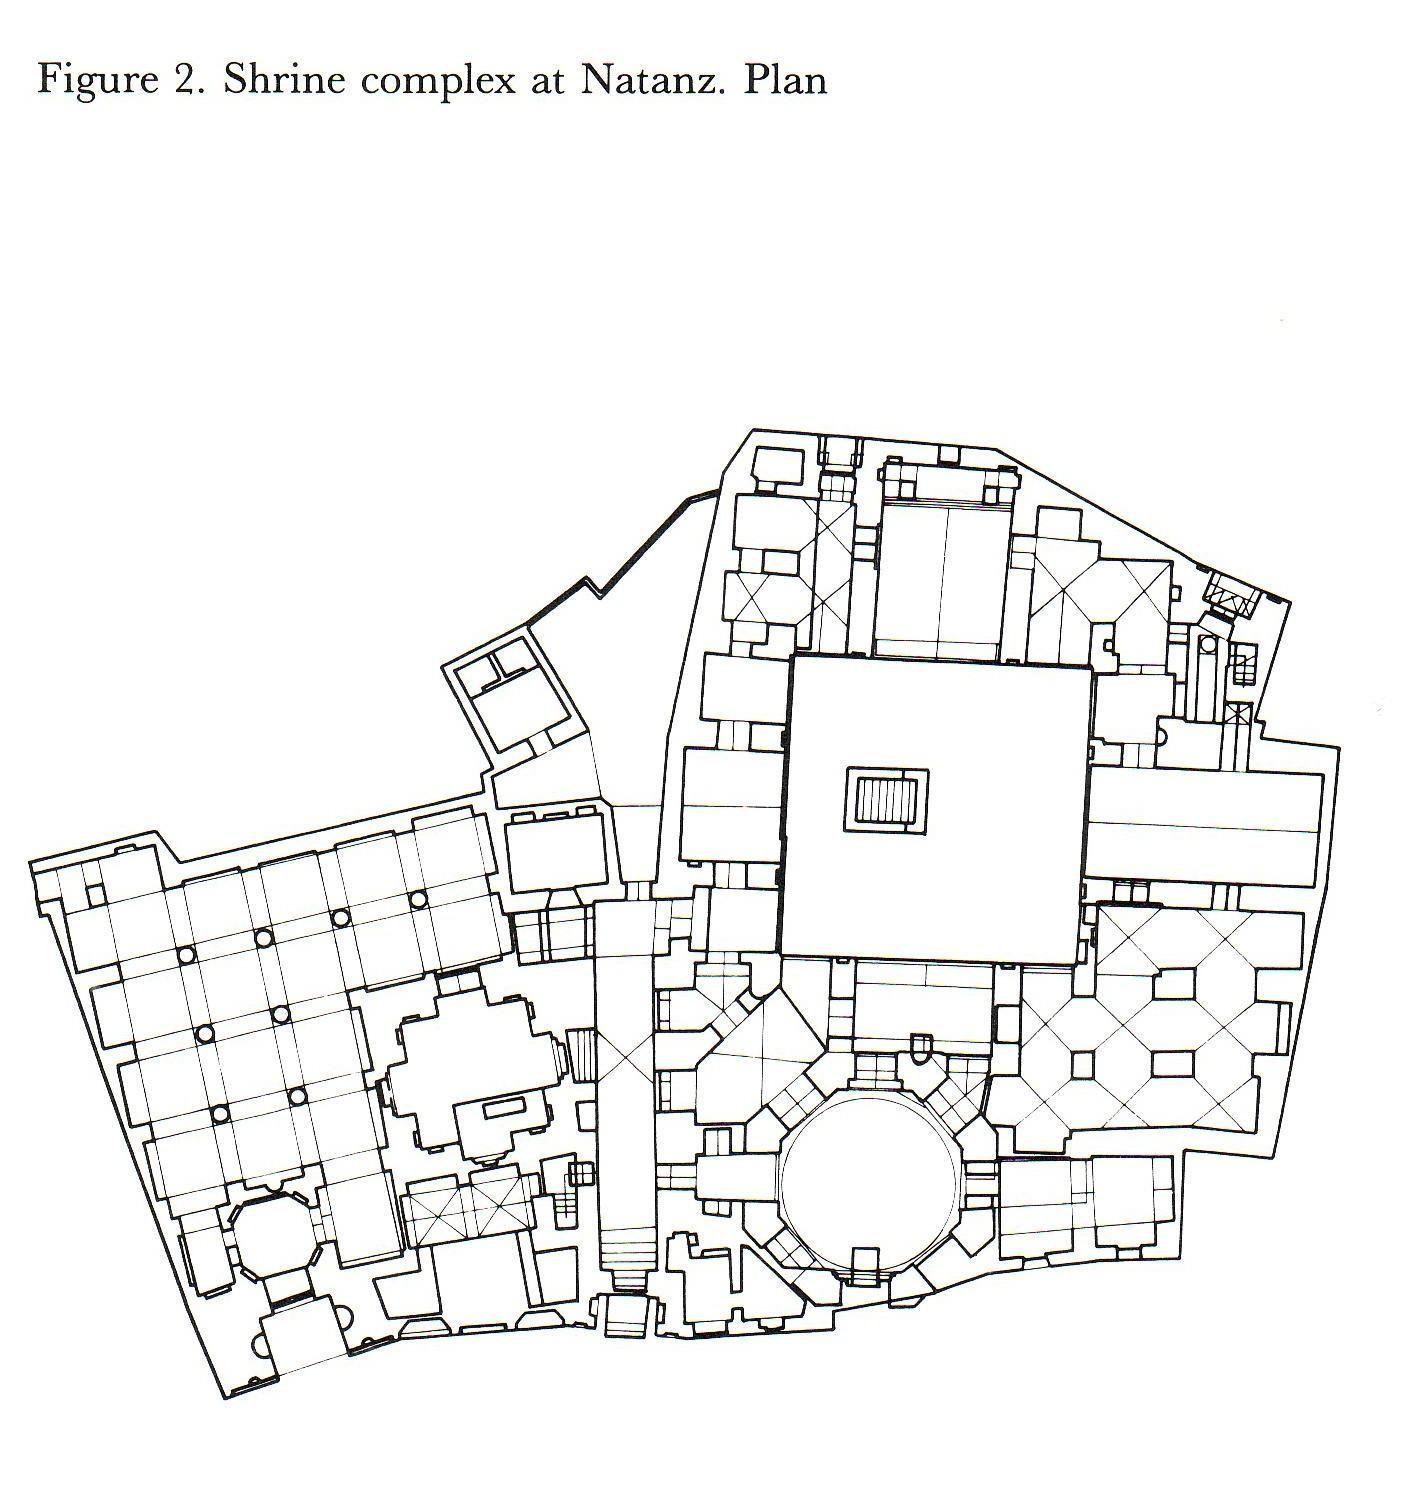 Natanz plan of the shirine of abd al samad 1300 12 iran for Plan tlemcen